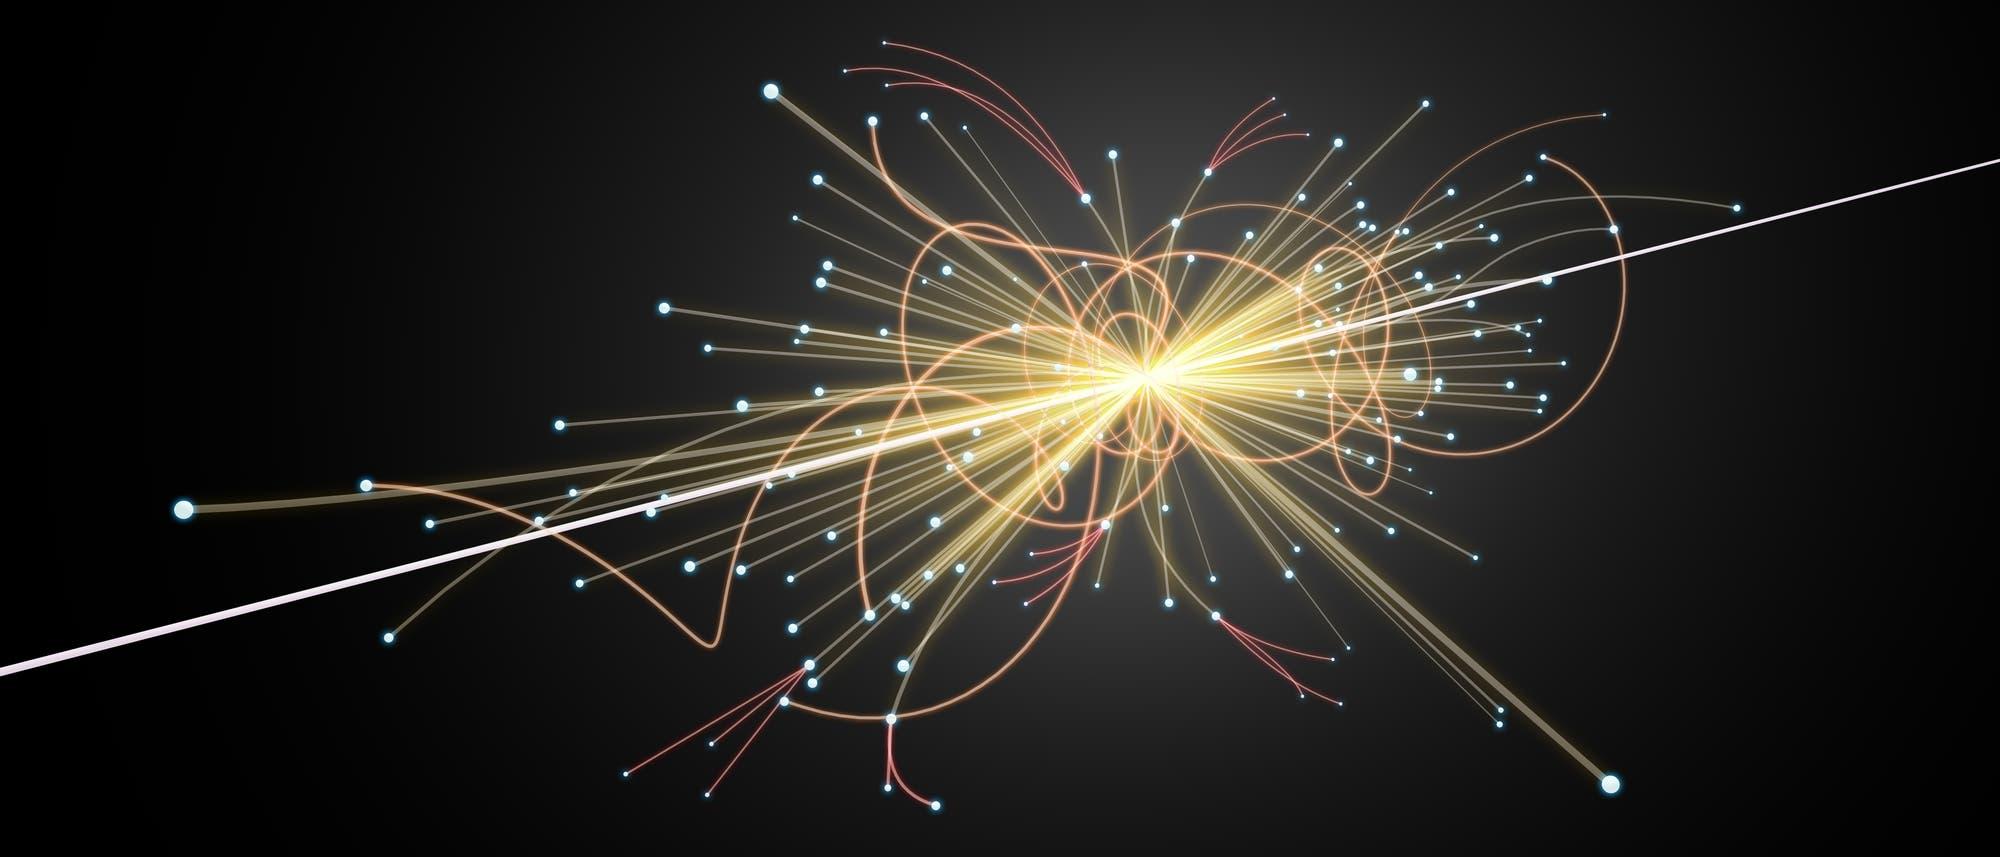 5. Nachweis des Higgs-Bosons